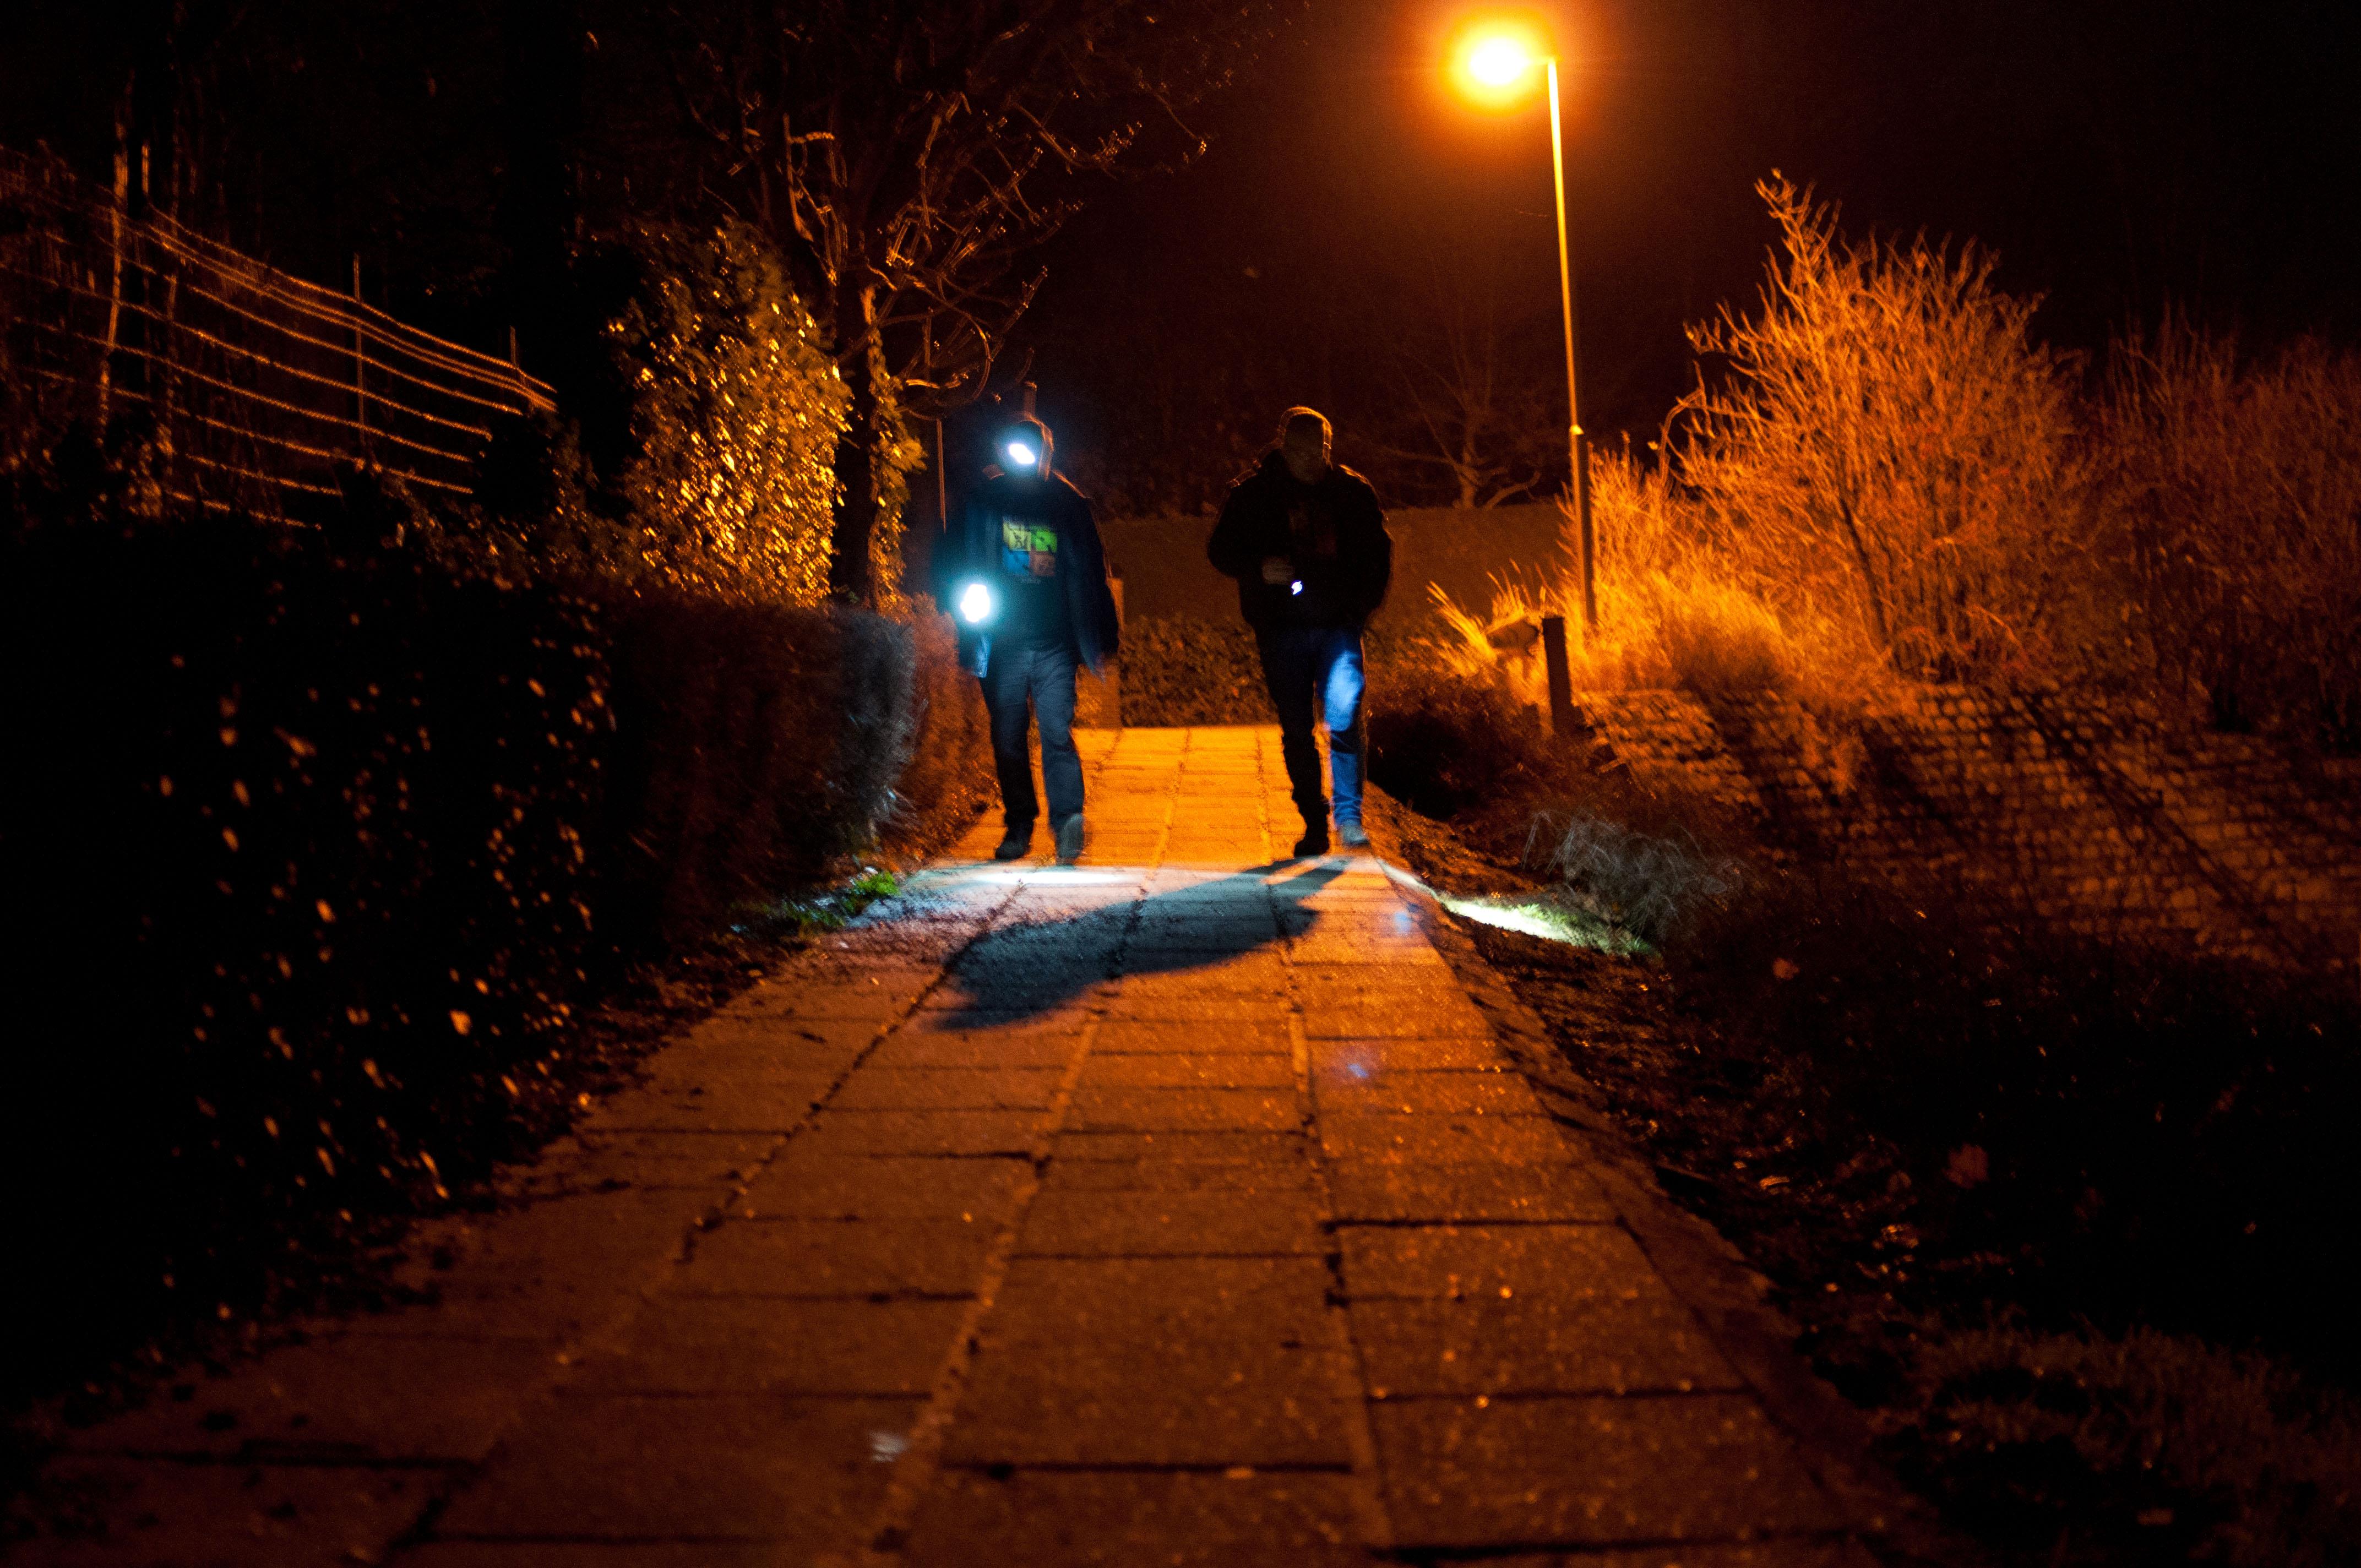 Fright Night - Nachtcaches wandeling